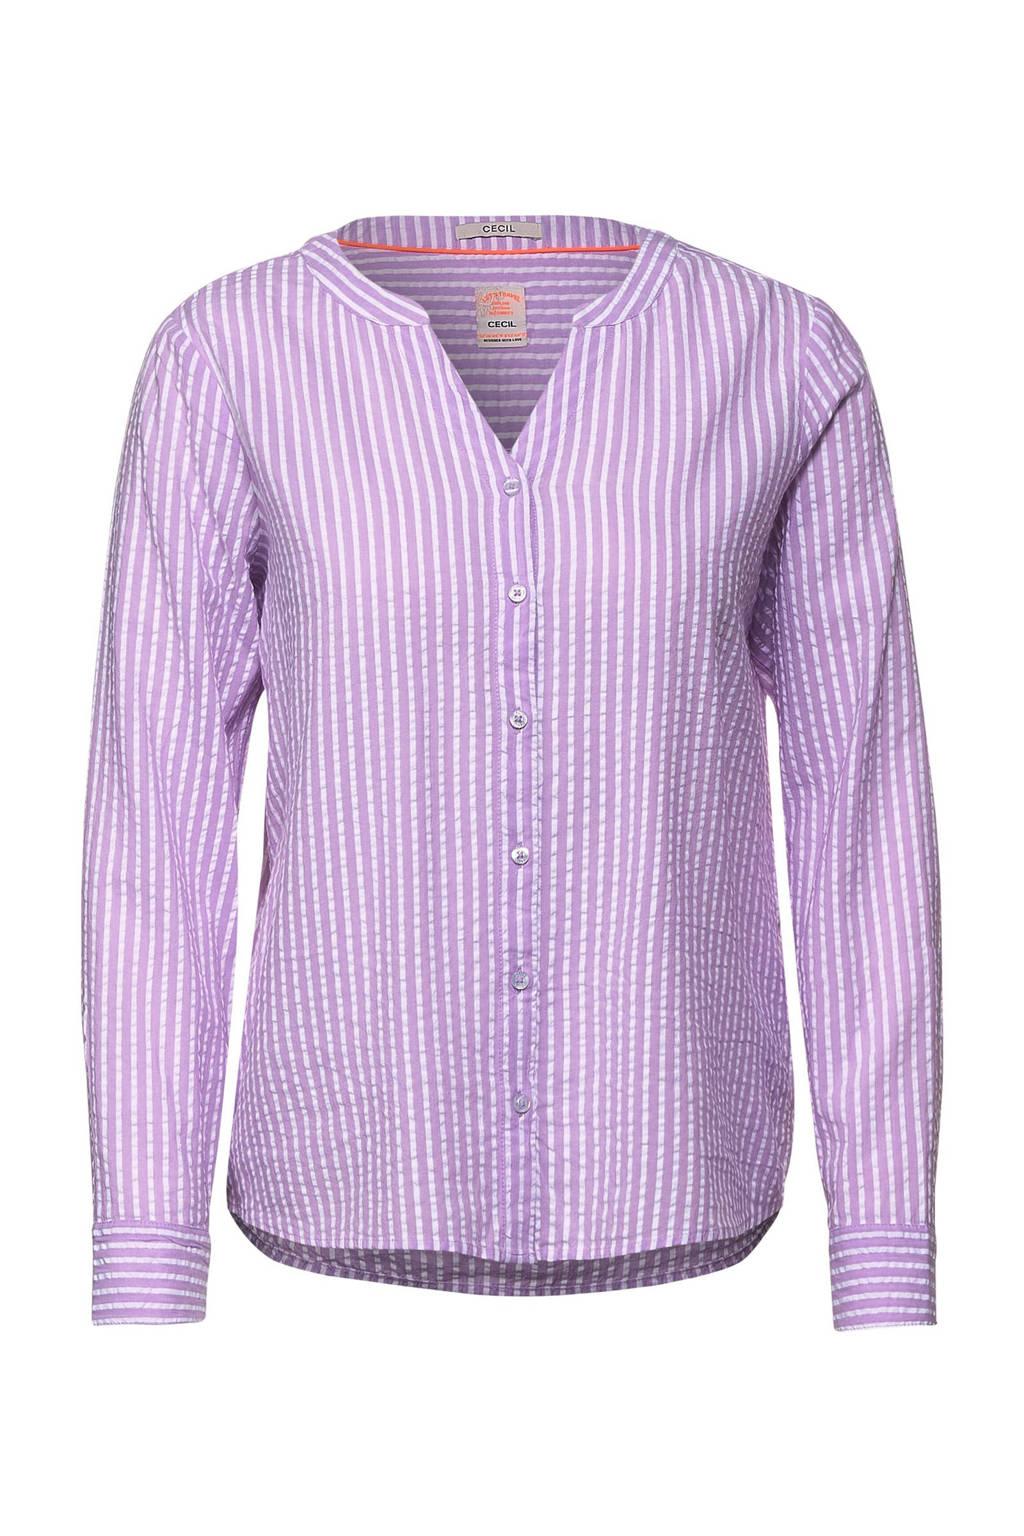 CECIL gestreepte blouse lila/wit, Lila/wit